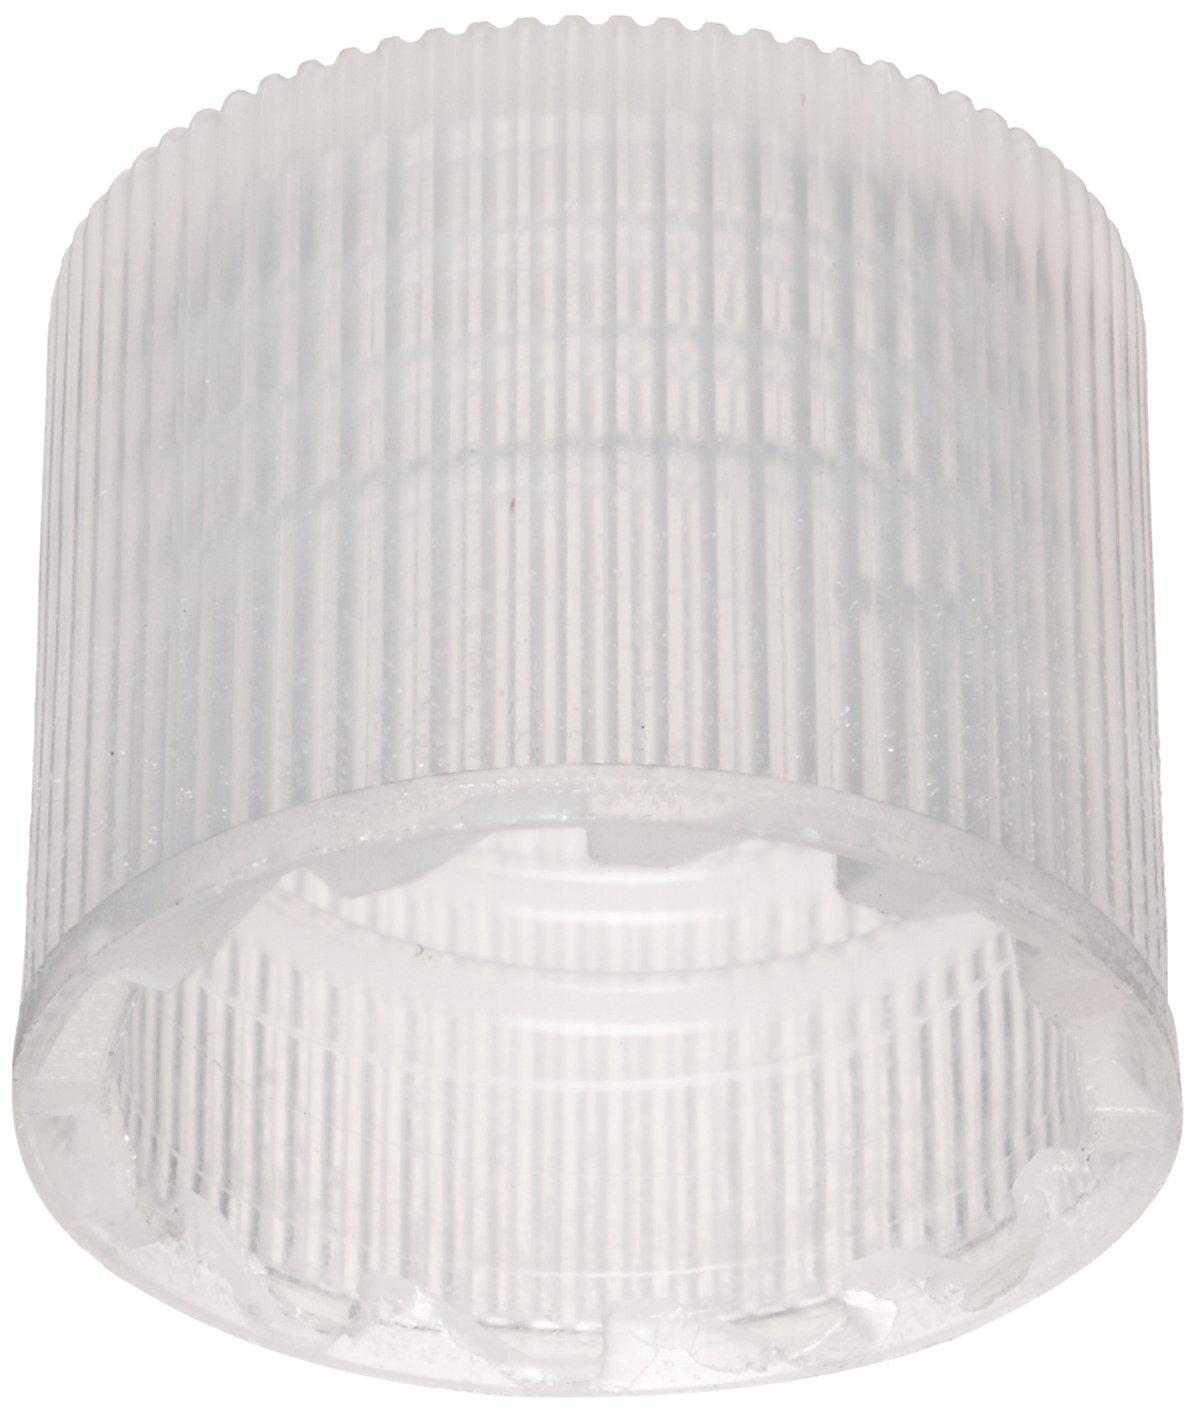 Natural Bulk Pack Kimble-Chase 18415 Polypropylene Centrifuge Tube Cap 18-415 GPI Screw Thread Finish Case of 5000 Linerless